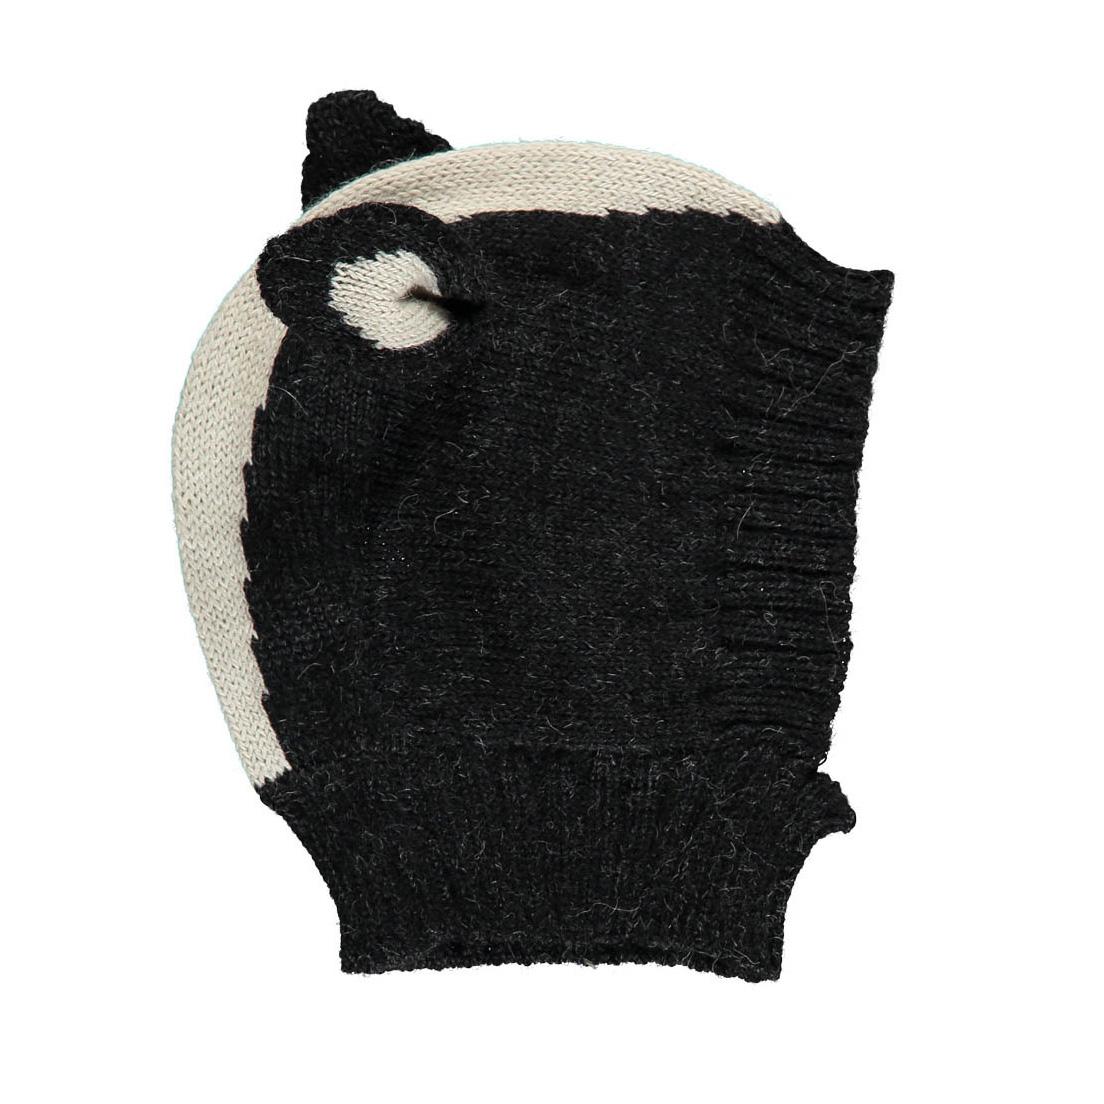 cagoule-furet-oeuf-nyc-smallable-soldes-alpaga-laine